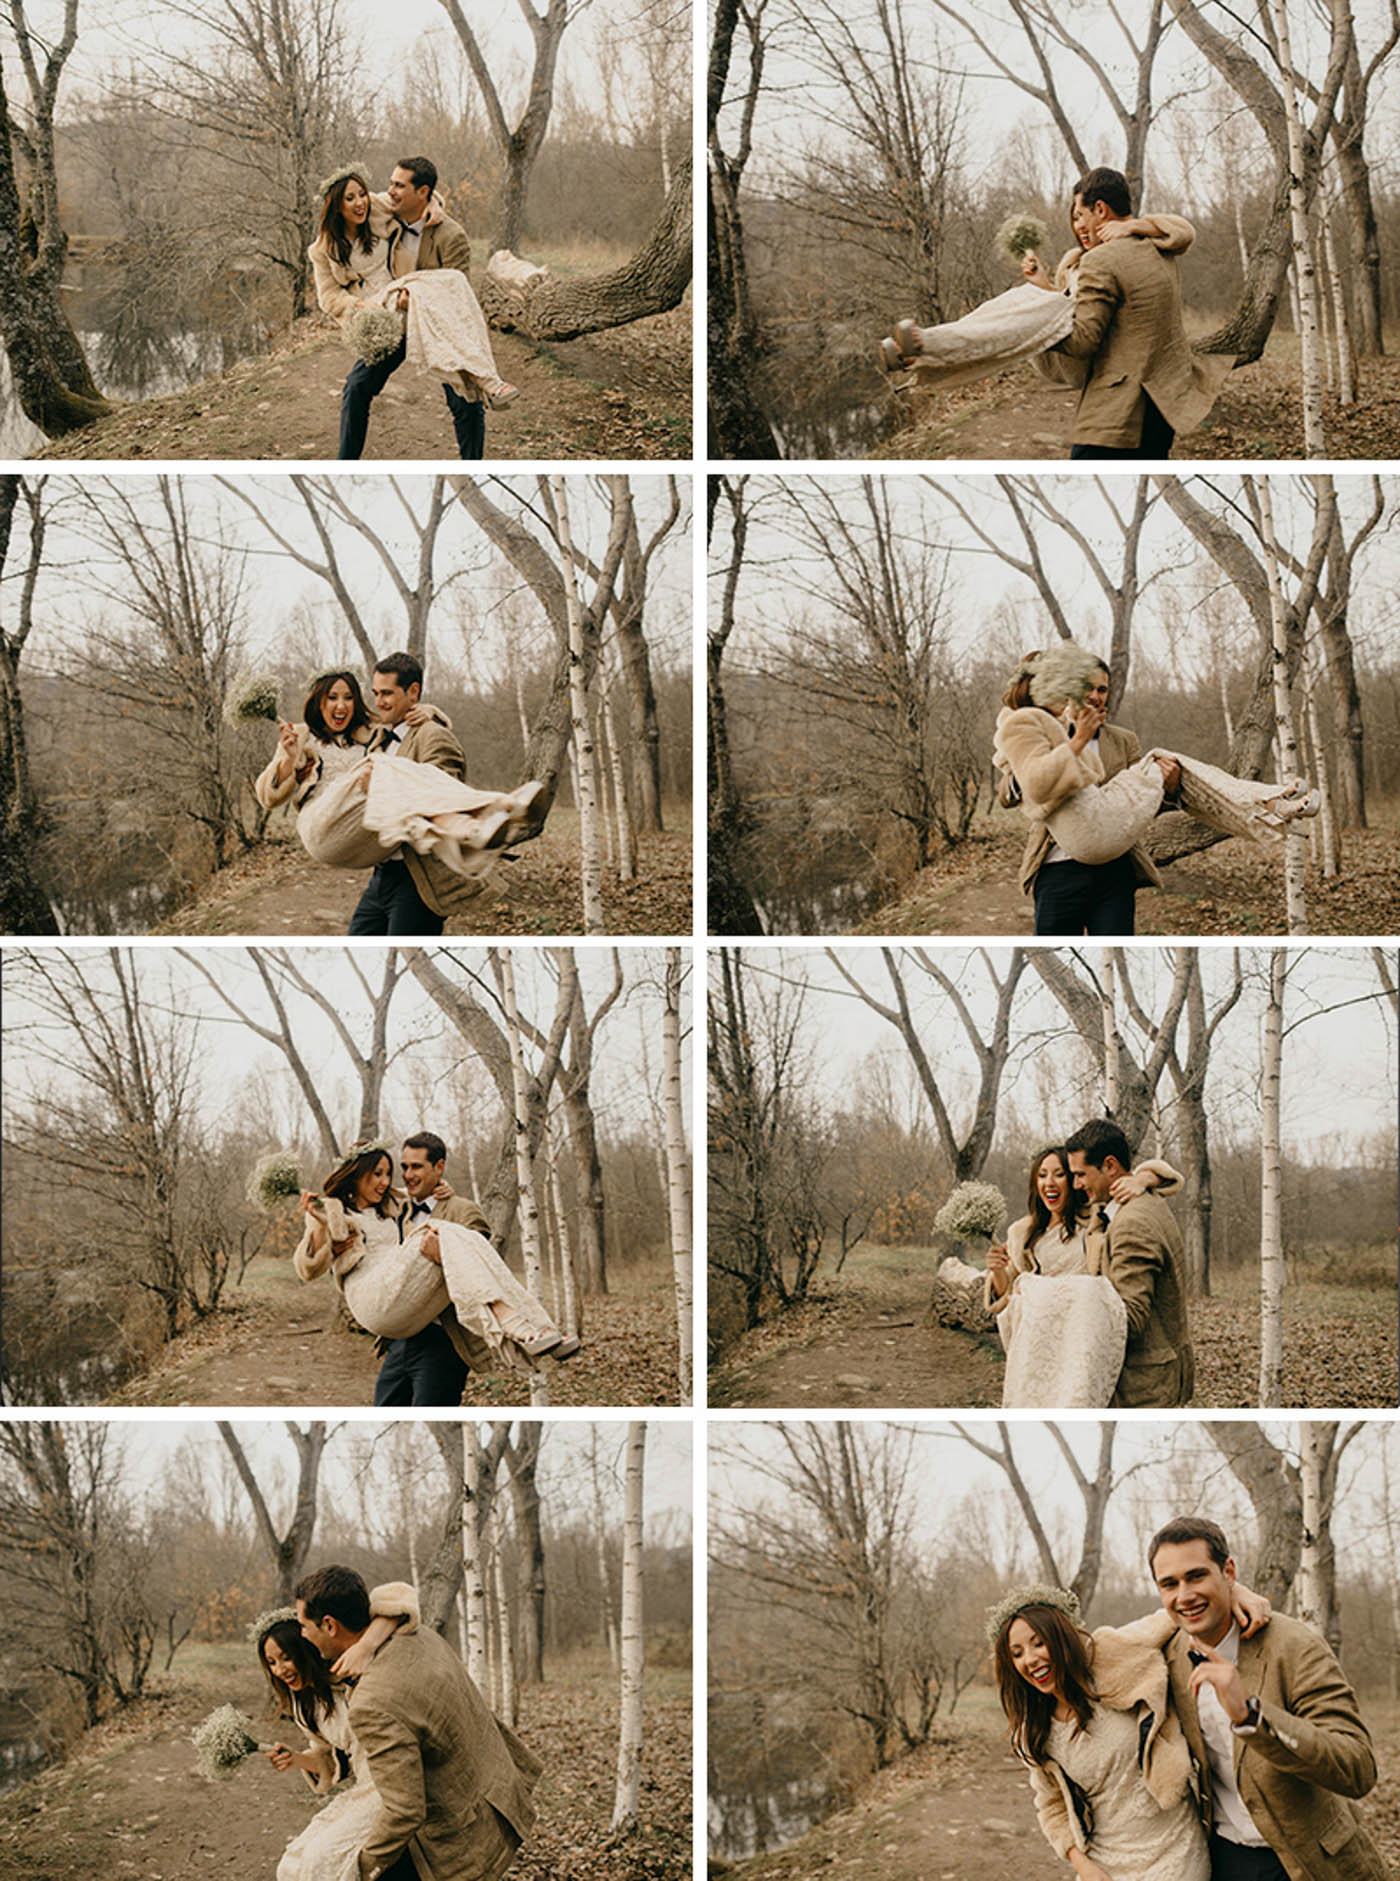 Velvet-Hush-fotografos-boda-al-aire-libre-madrid-106